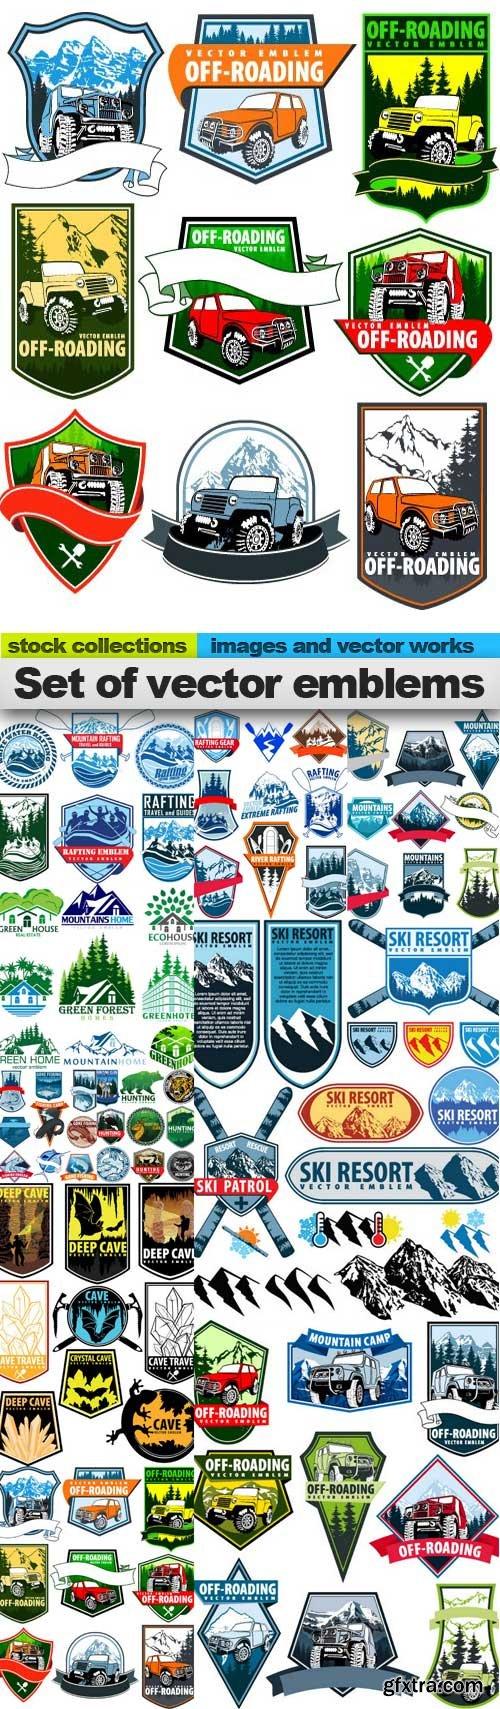 Set of vector emblems, 10 x EPS